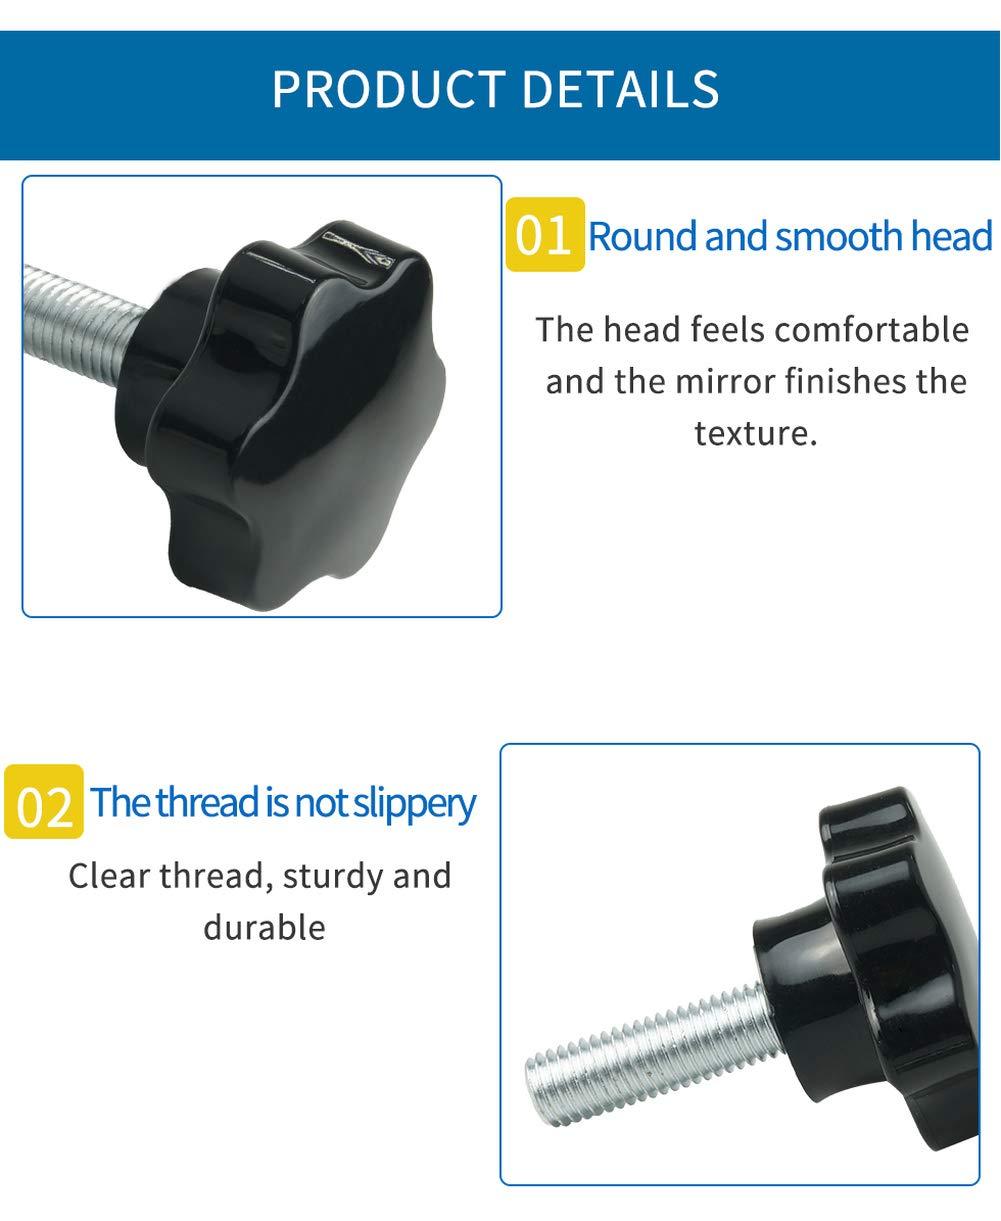 Luchang M12 M14 M16 2Pcs Thread Replacement Star Hand Knob Bakelite Hand Tighten Screw Tightening Screw Black Head Diameter 60mm 60mm,M14 2Pcs